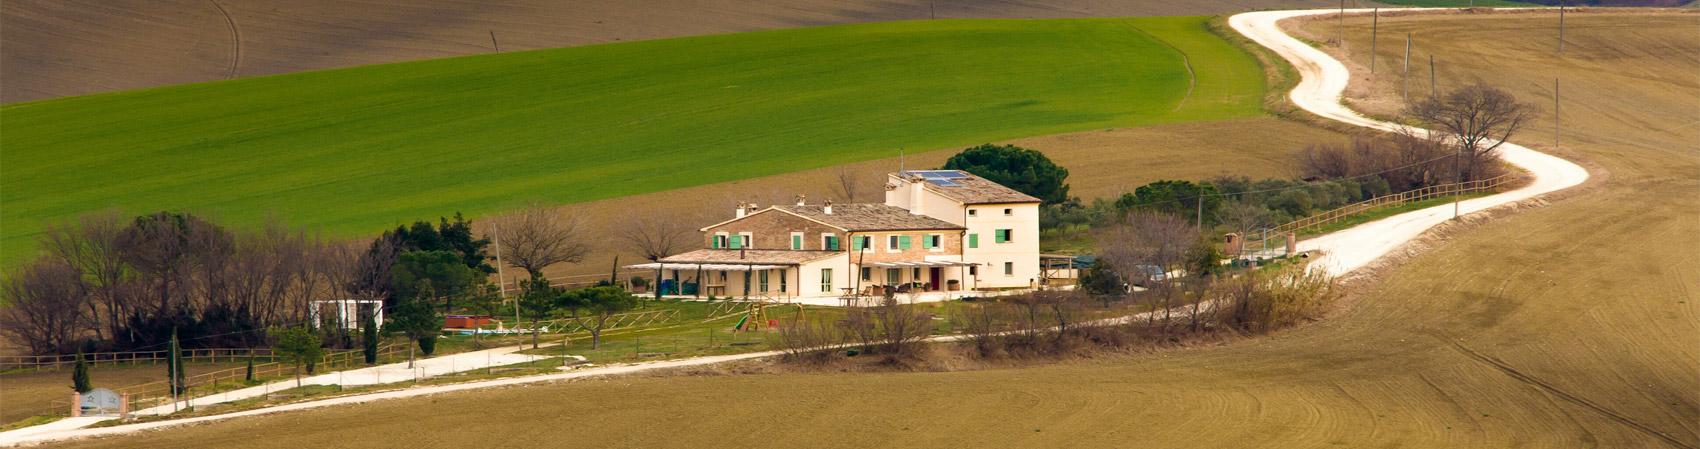 Le Maracla Country House di charme a jesi, camere, appartamenti, b&b